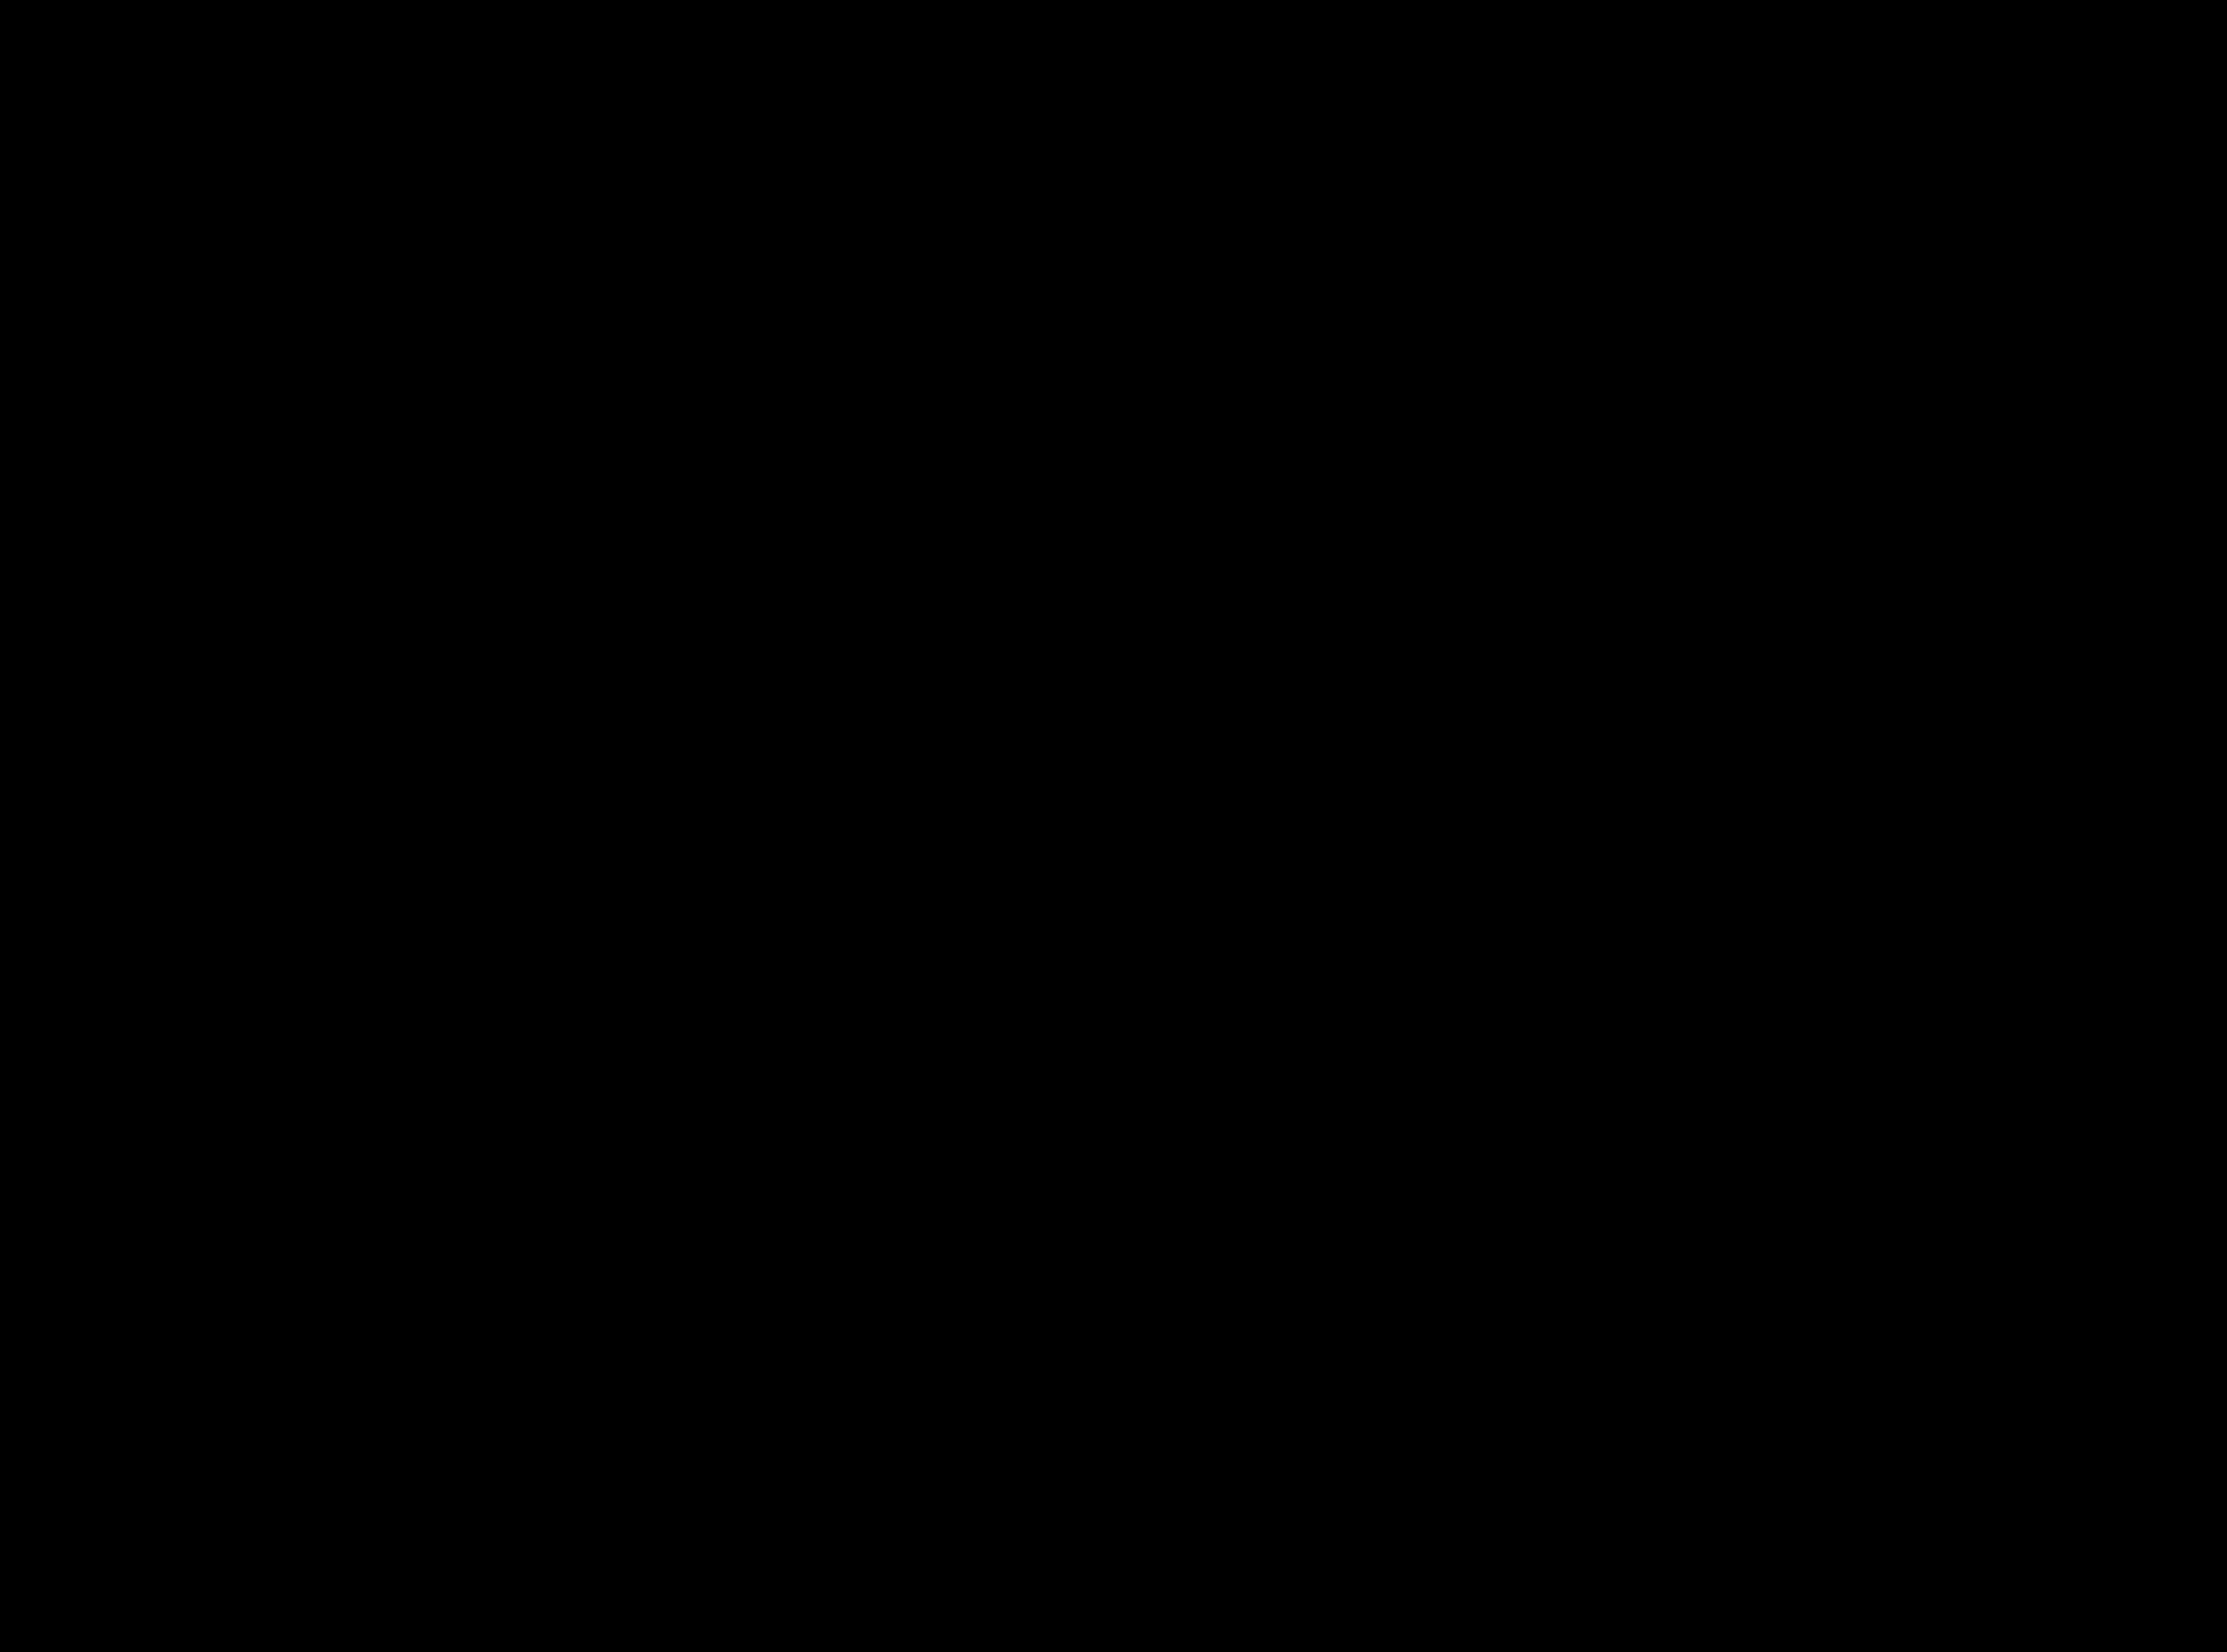 ARNOLDS PARK IN LIGHTS DESIGNER PILLOW